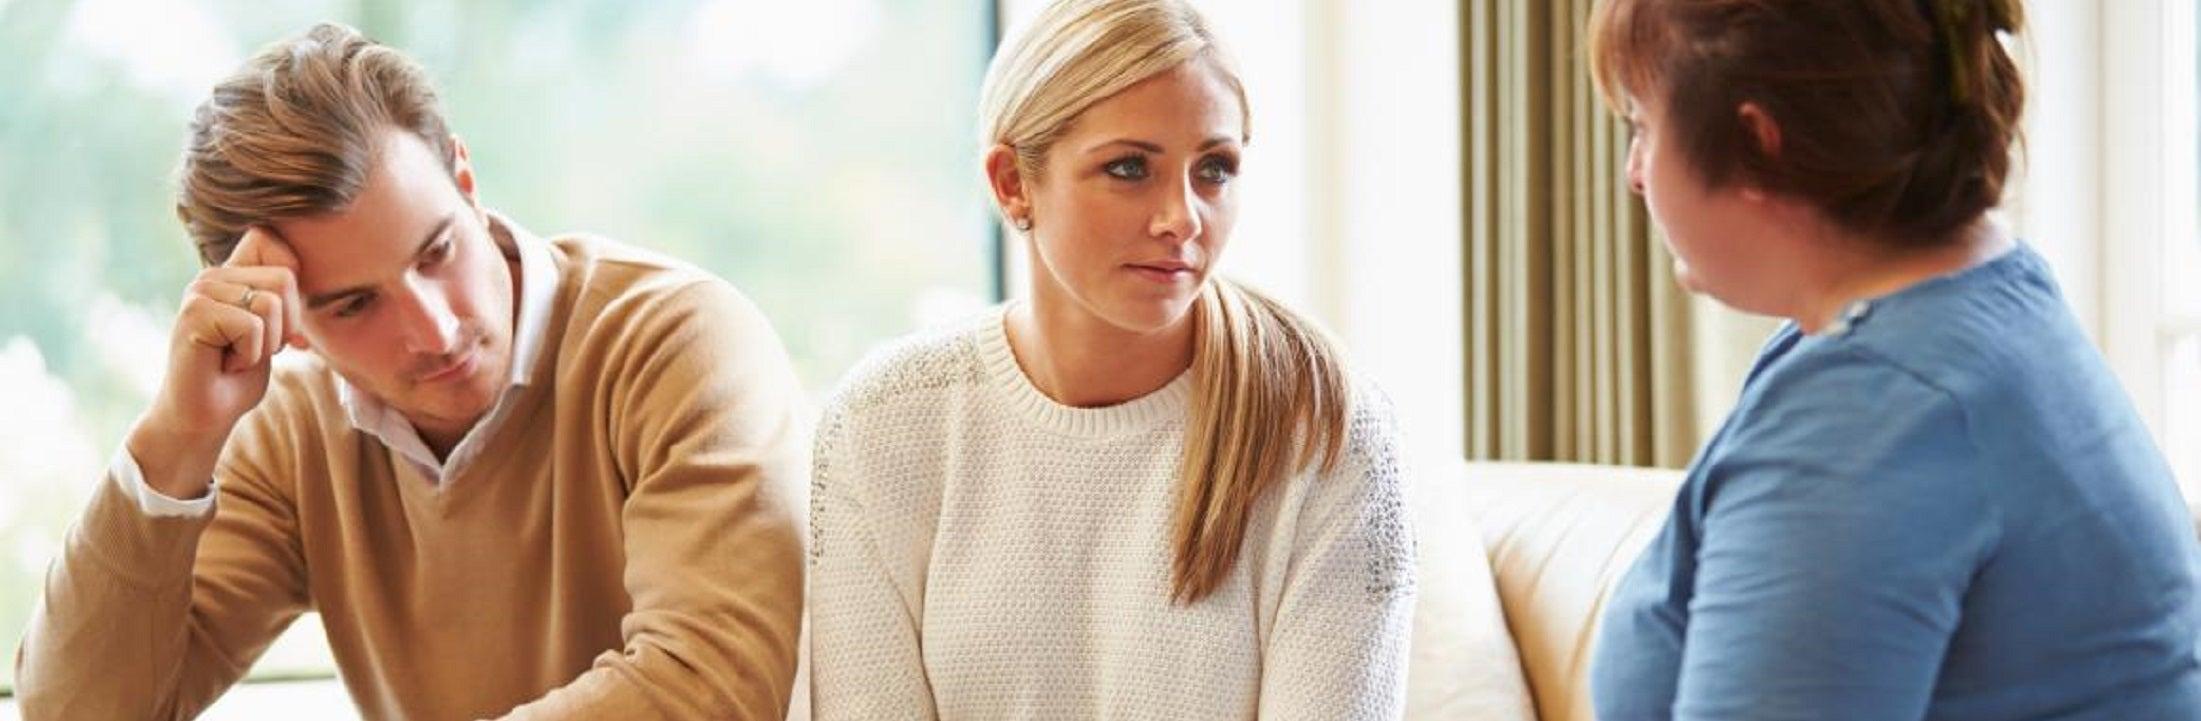 ouders in gesprek met parenting coordinator